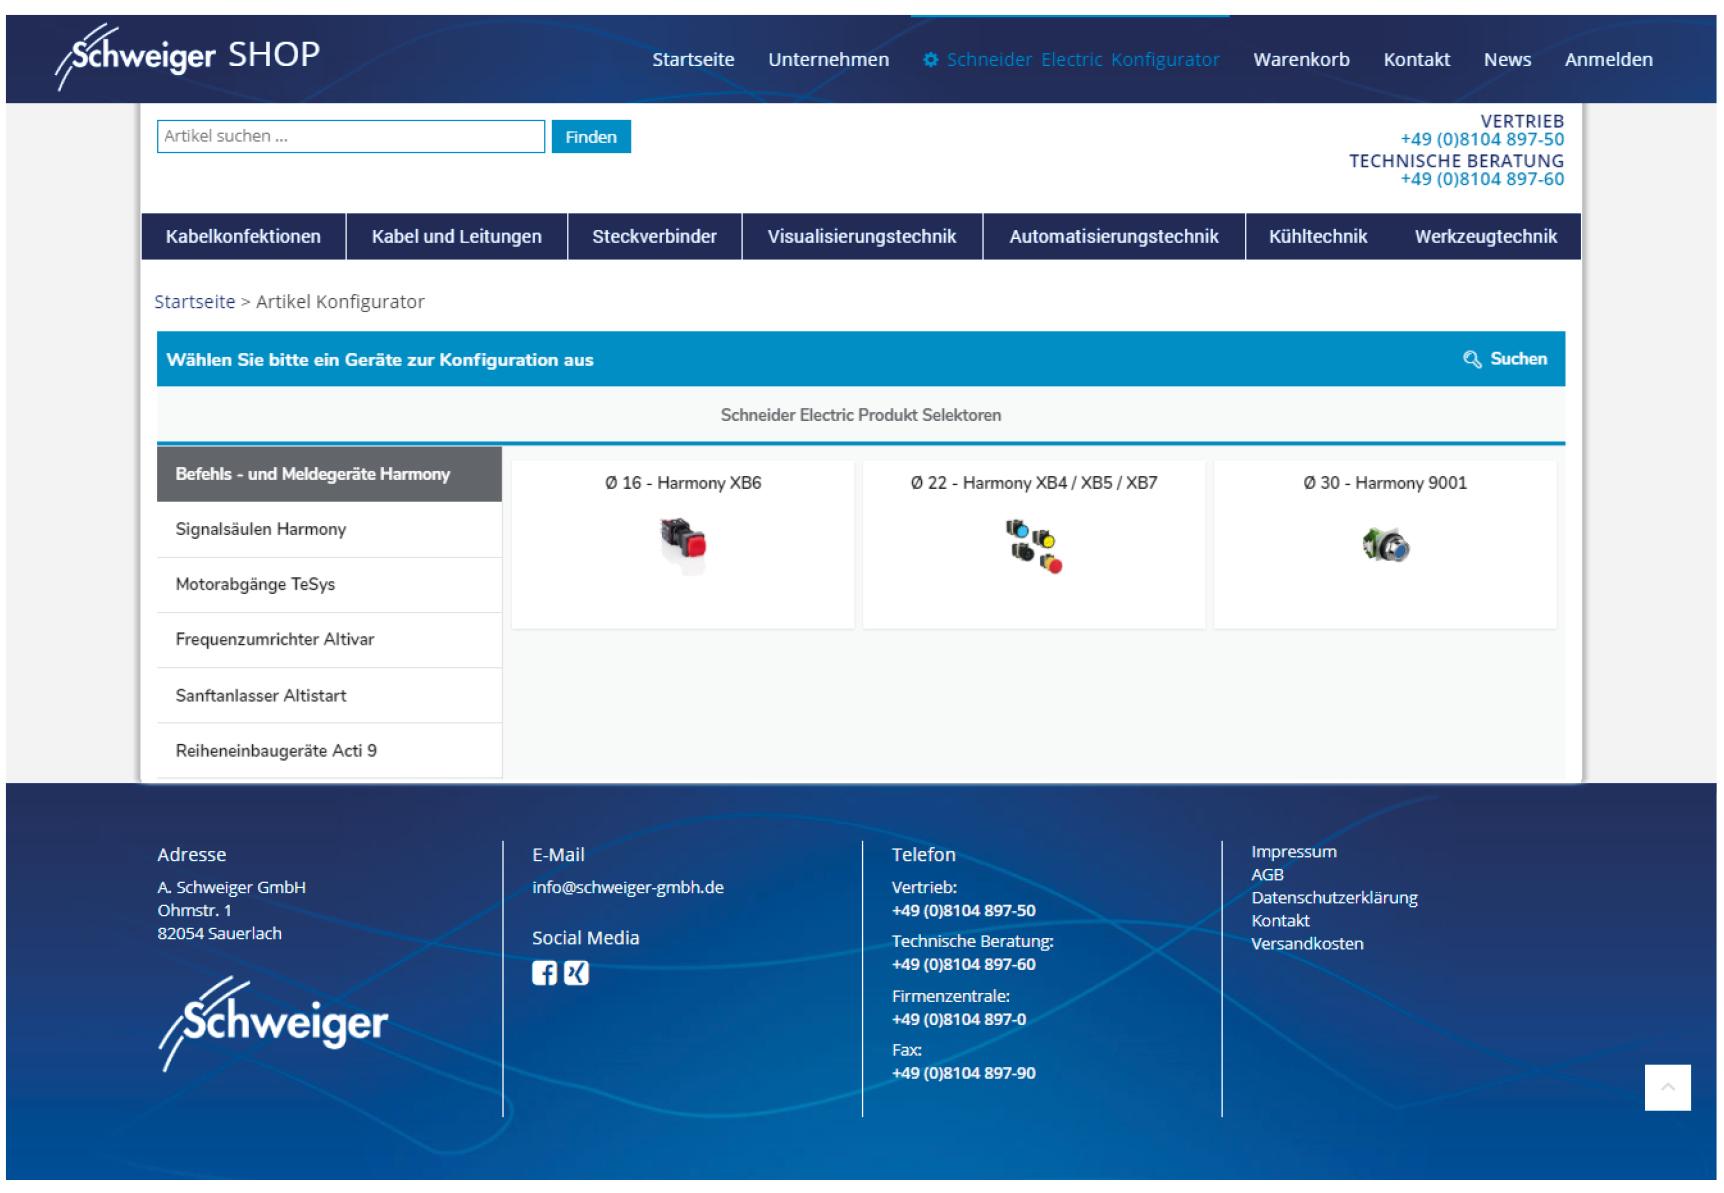 Schneider Electric Konfigurator Produktkategorie